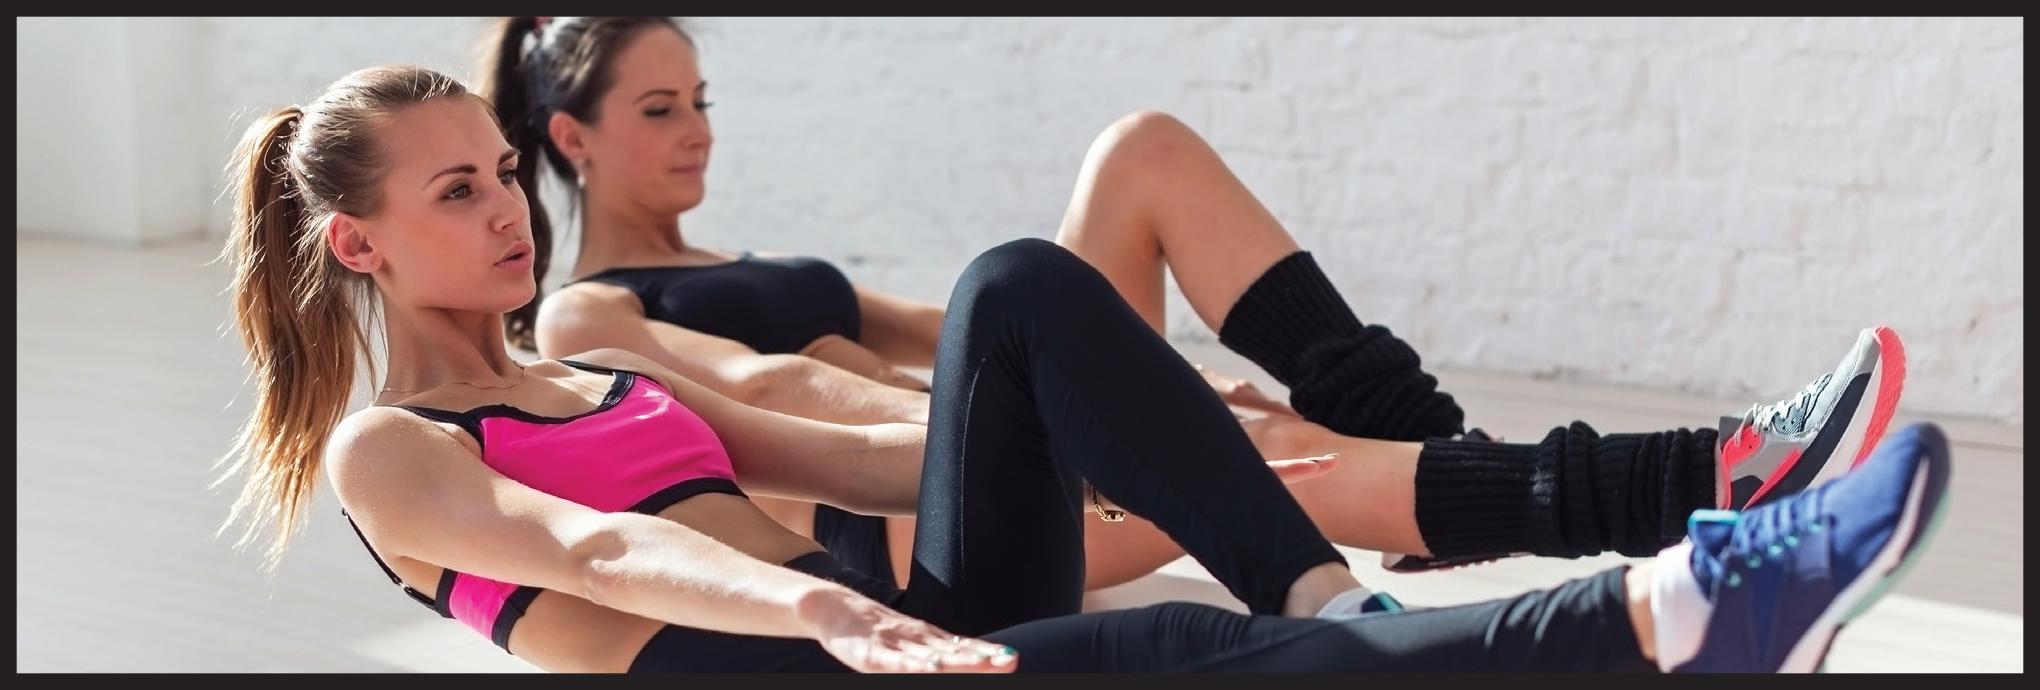 WMI Fitness Health and Wellness Header